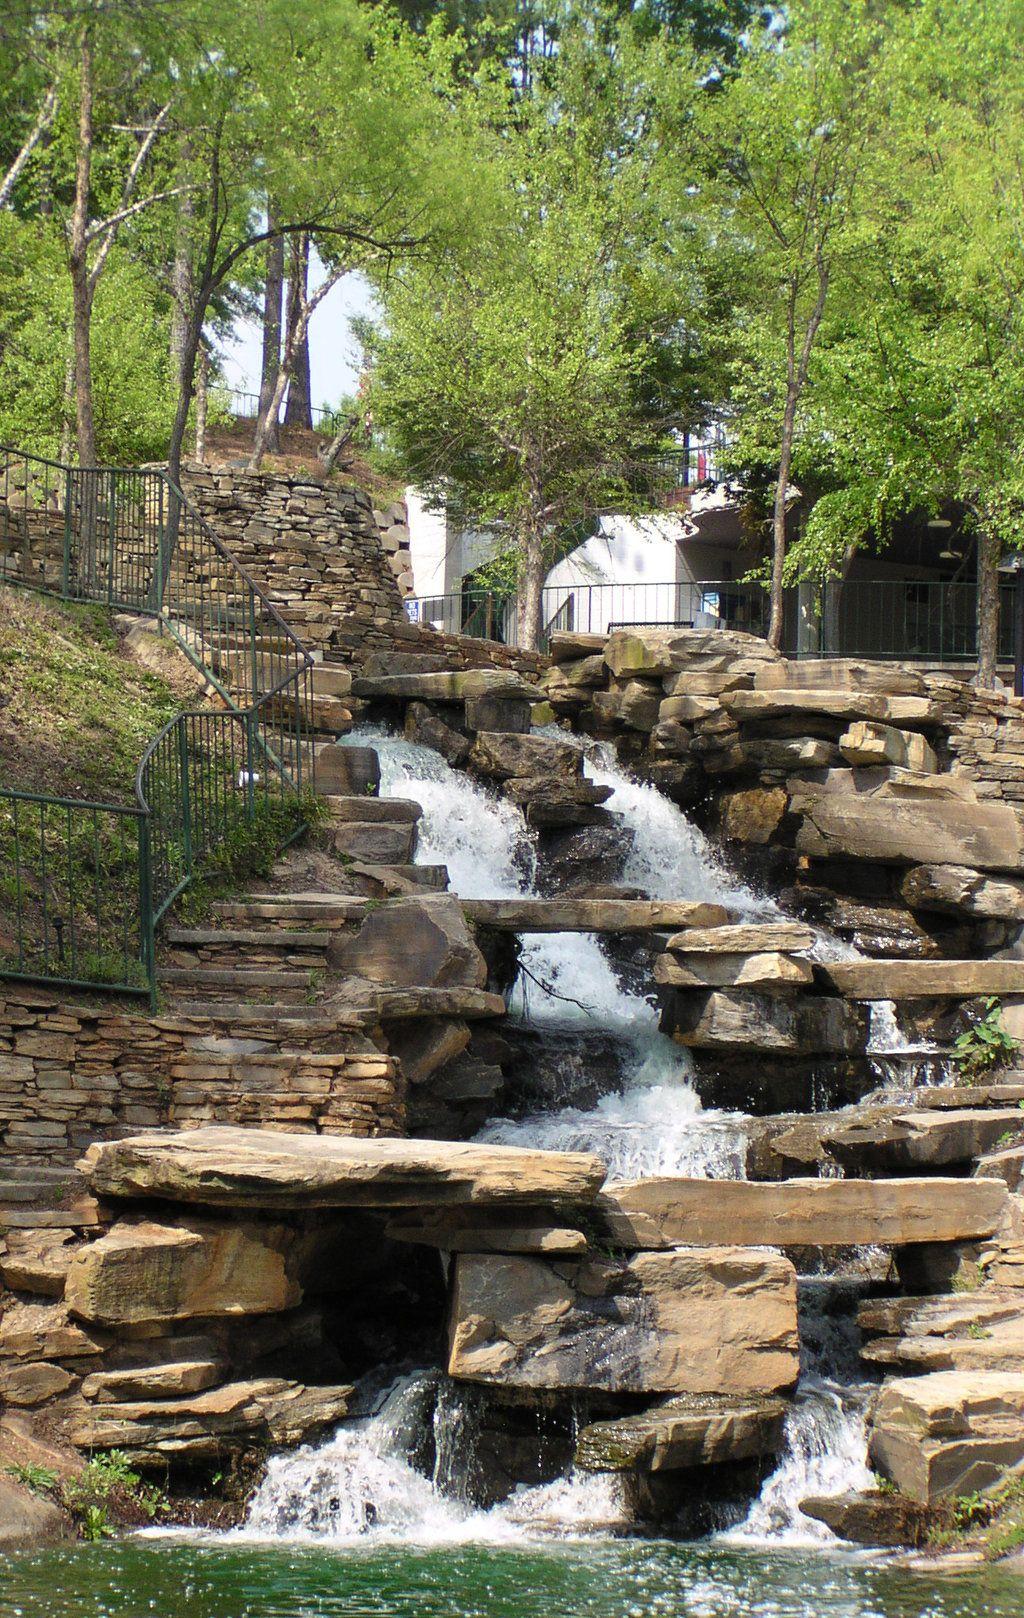 811690c4b7704d960c3b5517422f7241 - Columbia South River Gardens Atlanta Ga Reviews